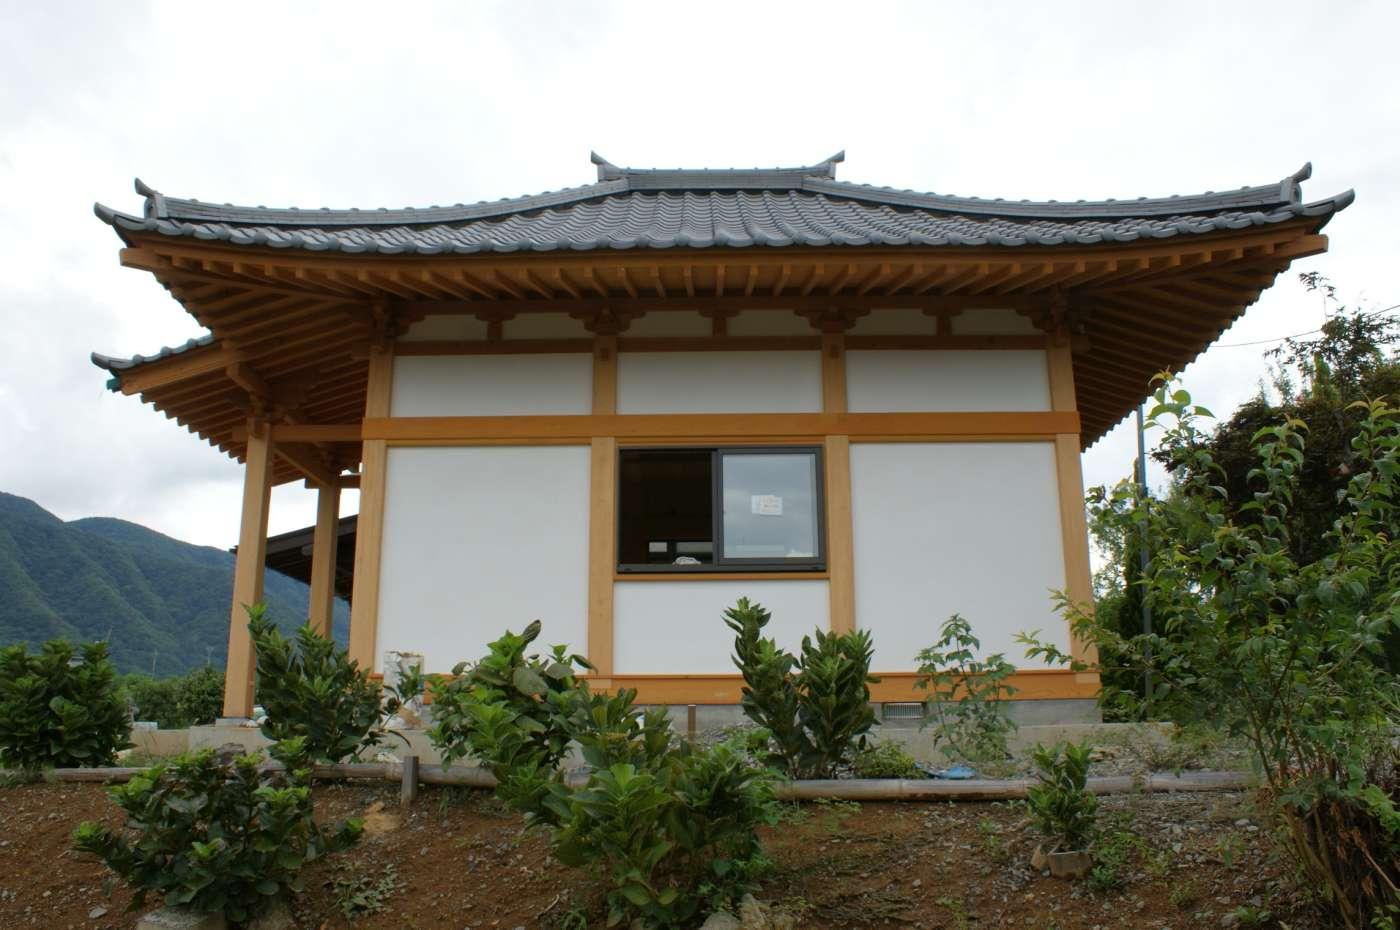 http://sumainomatsuki.com/folder1/DSC04891.JPG